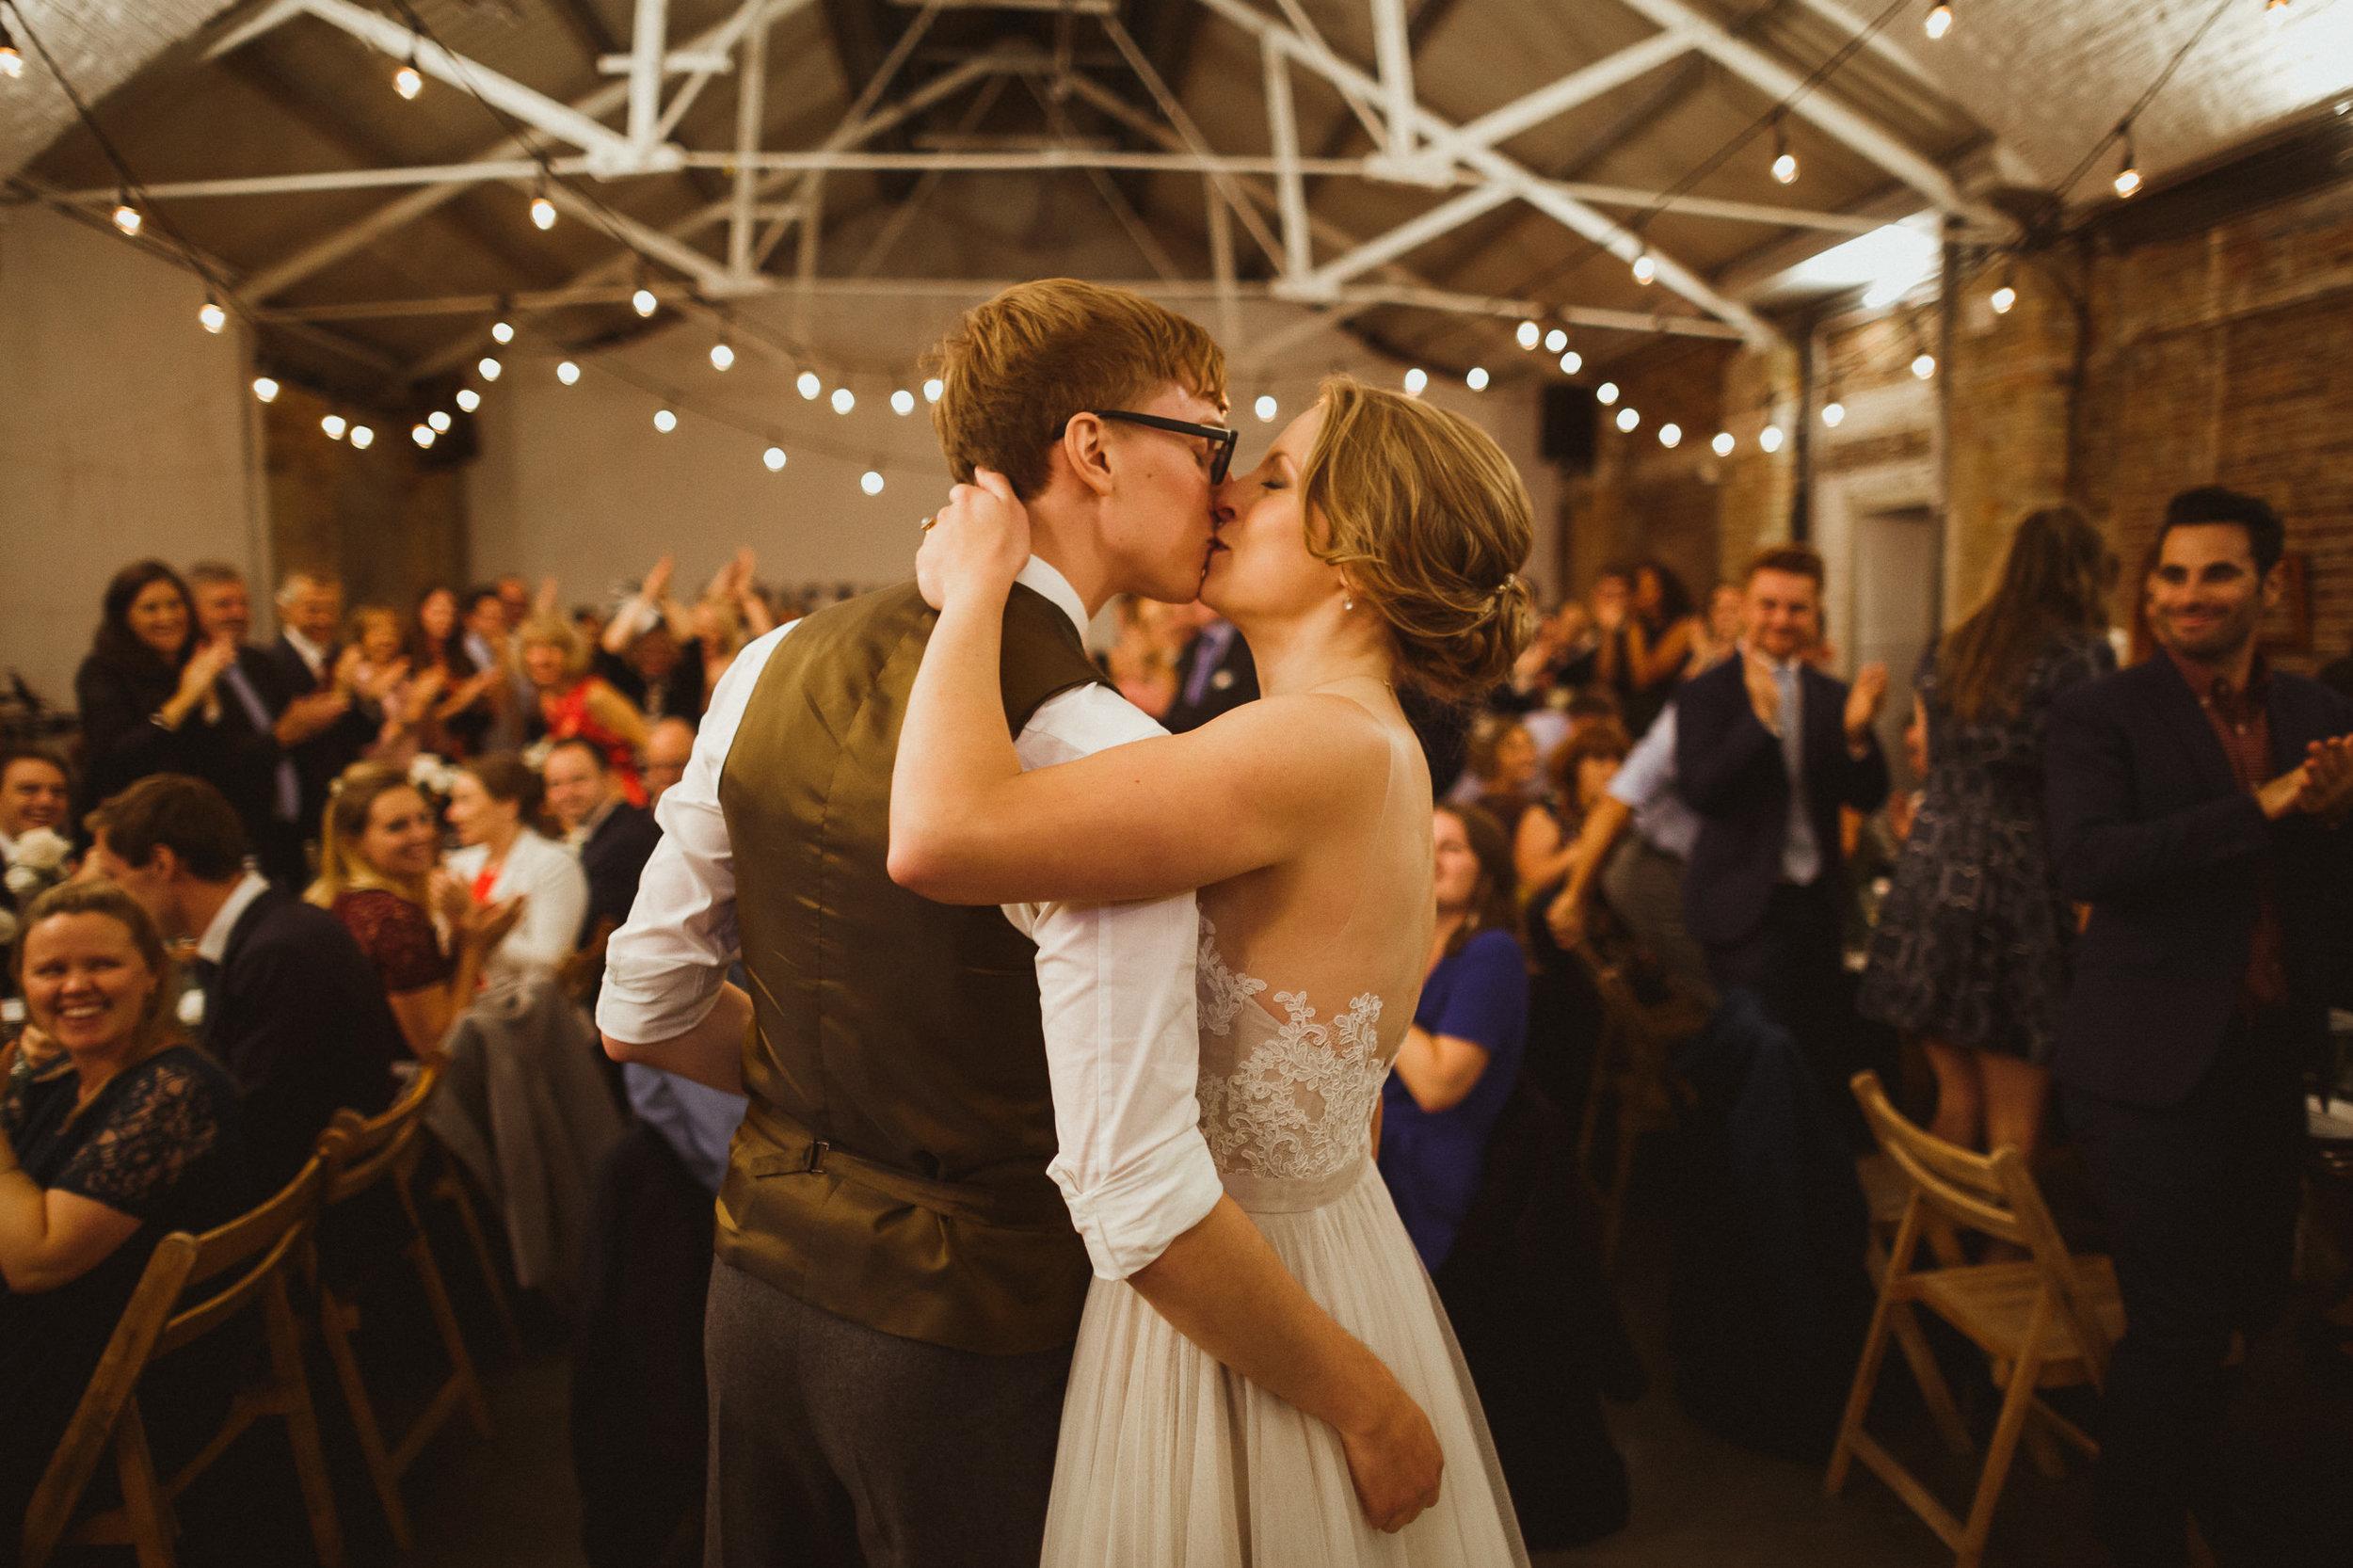 London-wedding-photographer-gione-da-silva-alex_paul-185.jpg